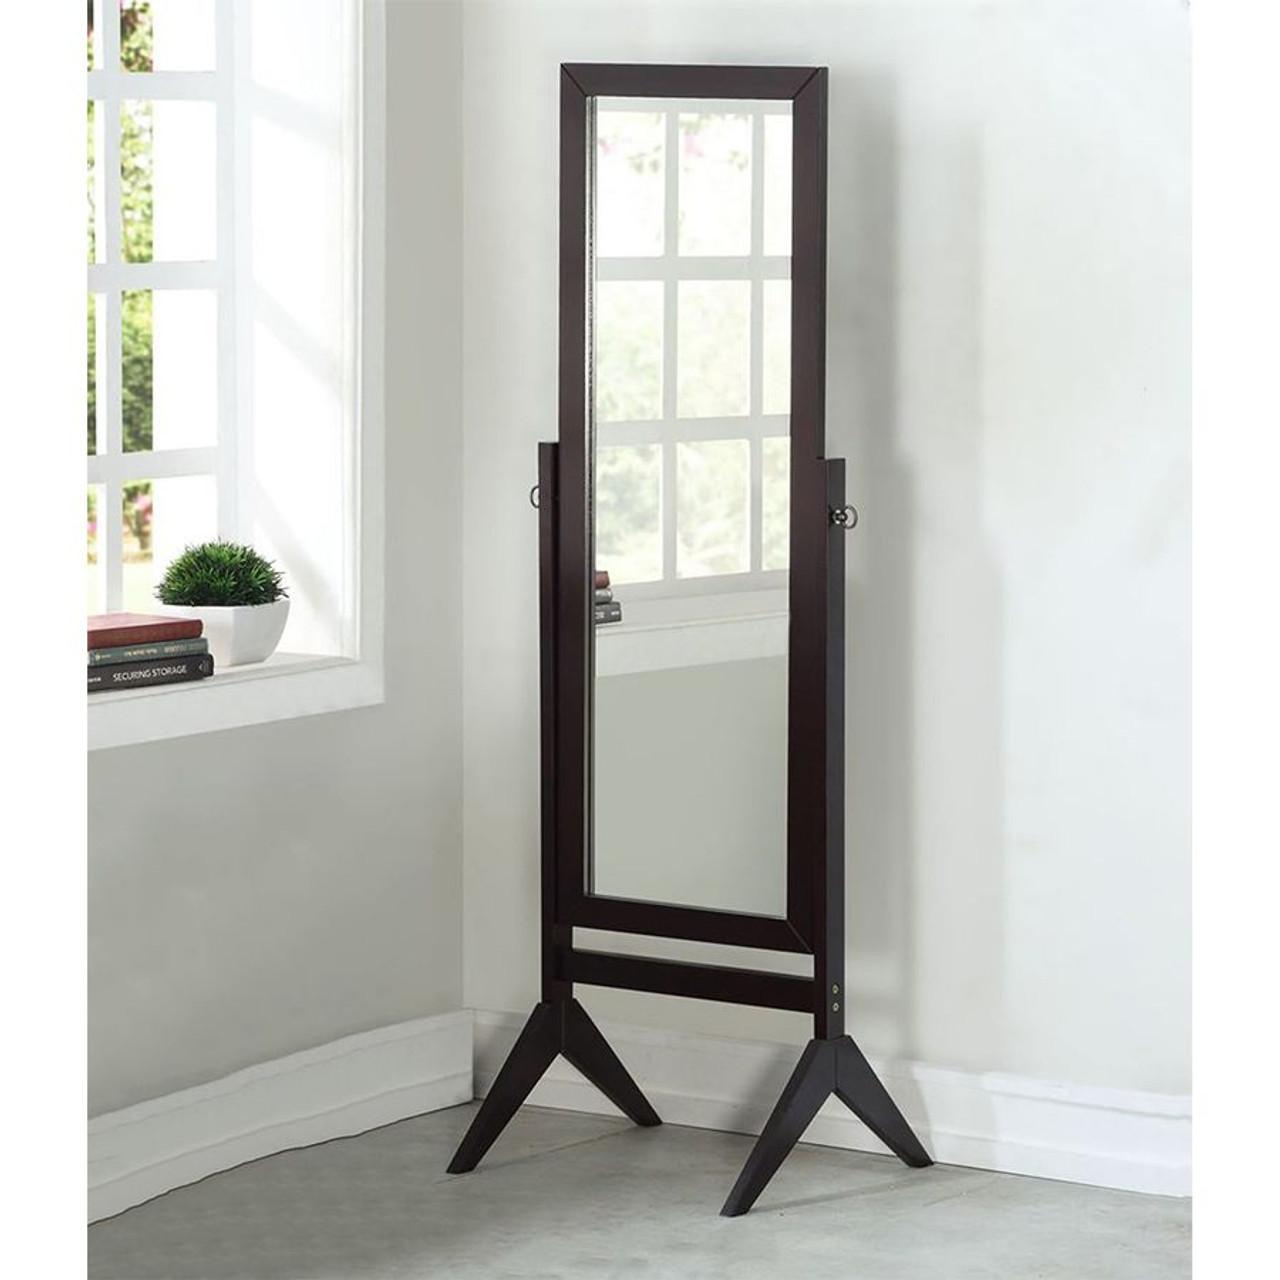 Wood Rectangular Cheval Floor Mirror, Free Standing Mirror